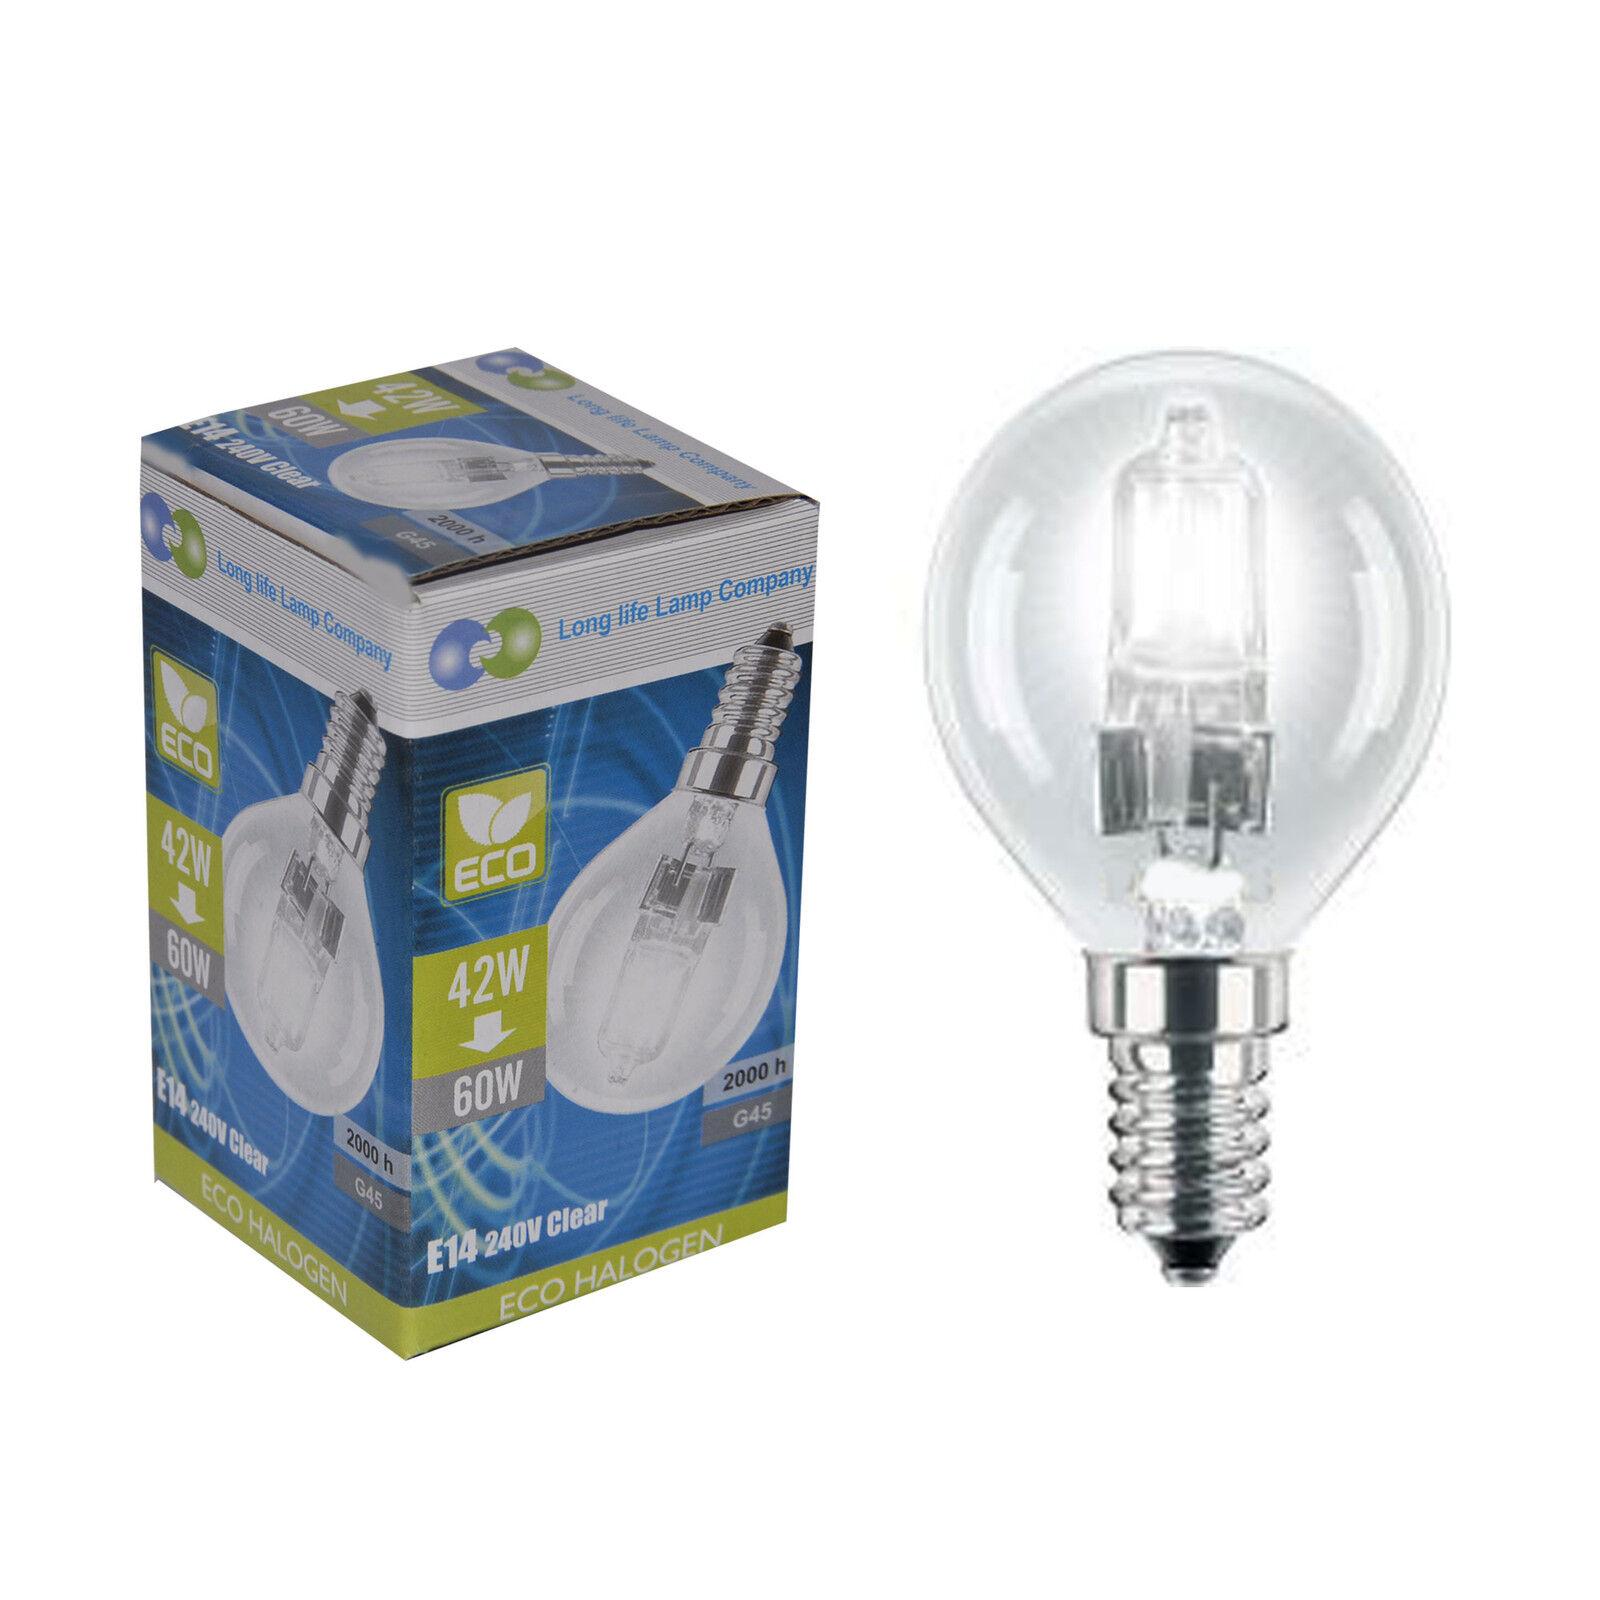 3 Eco Halogen Energy Saving Golf Balls Light Bulb 42w =60w ...